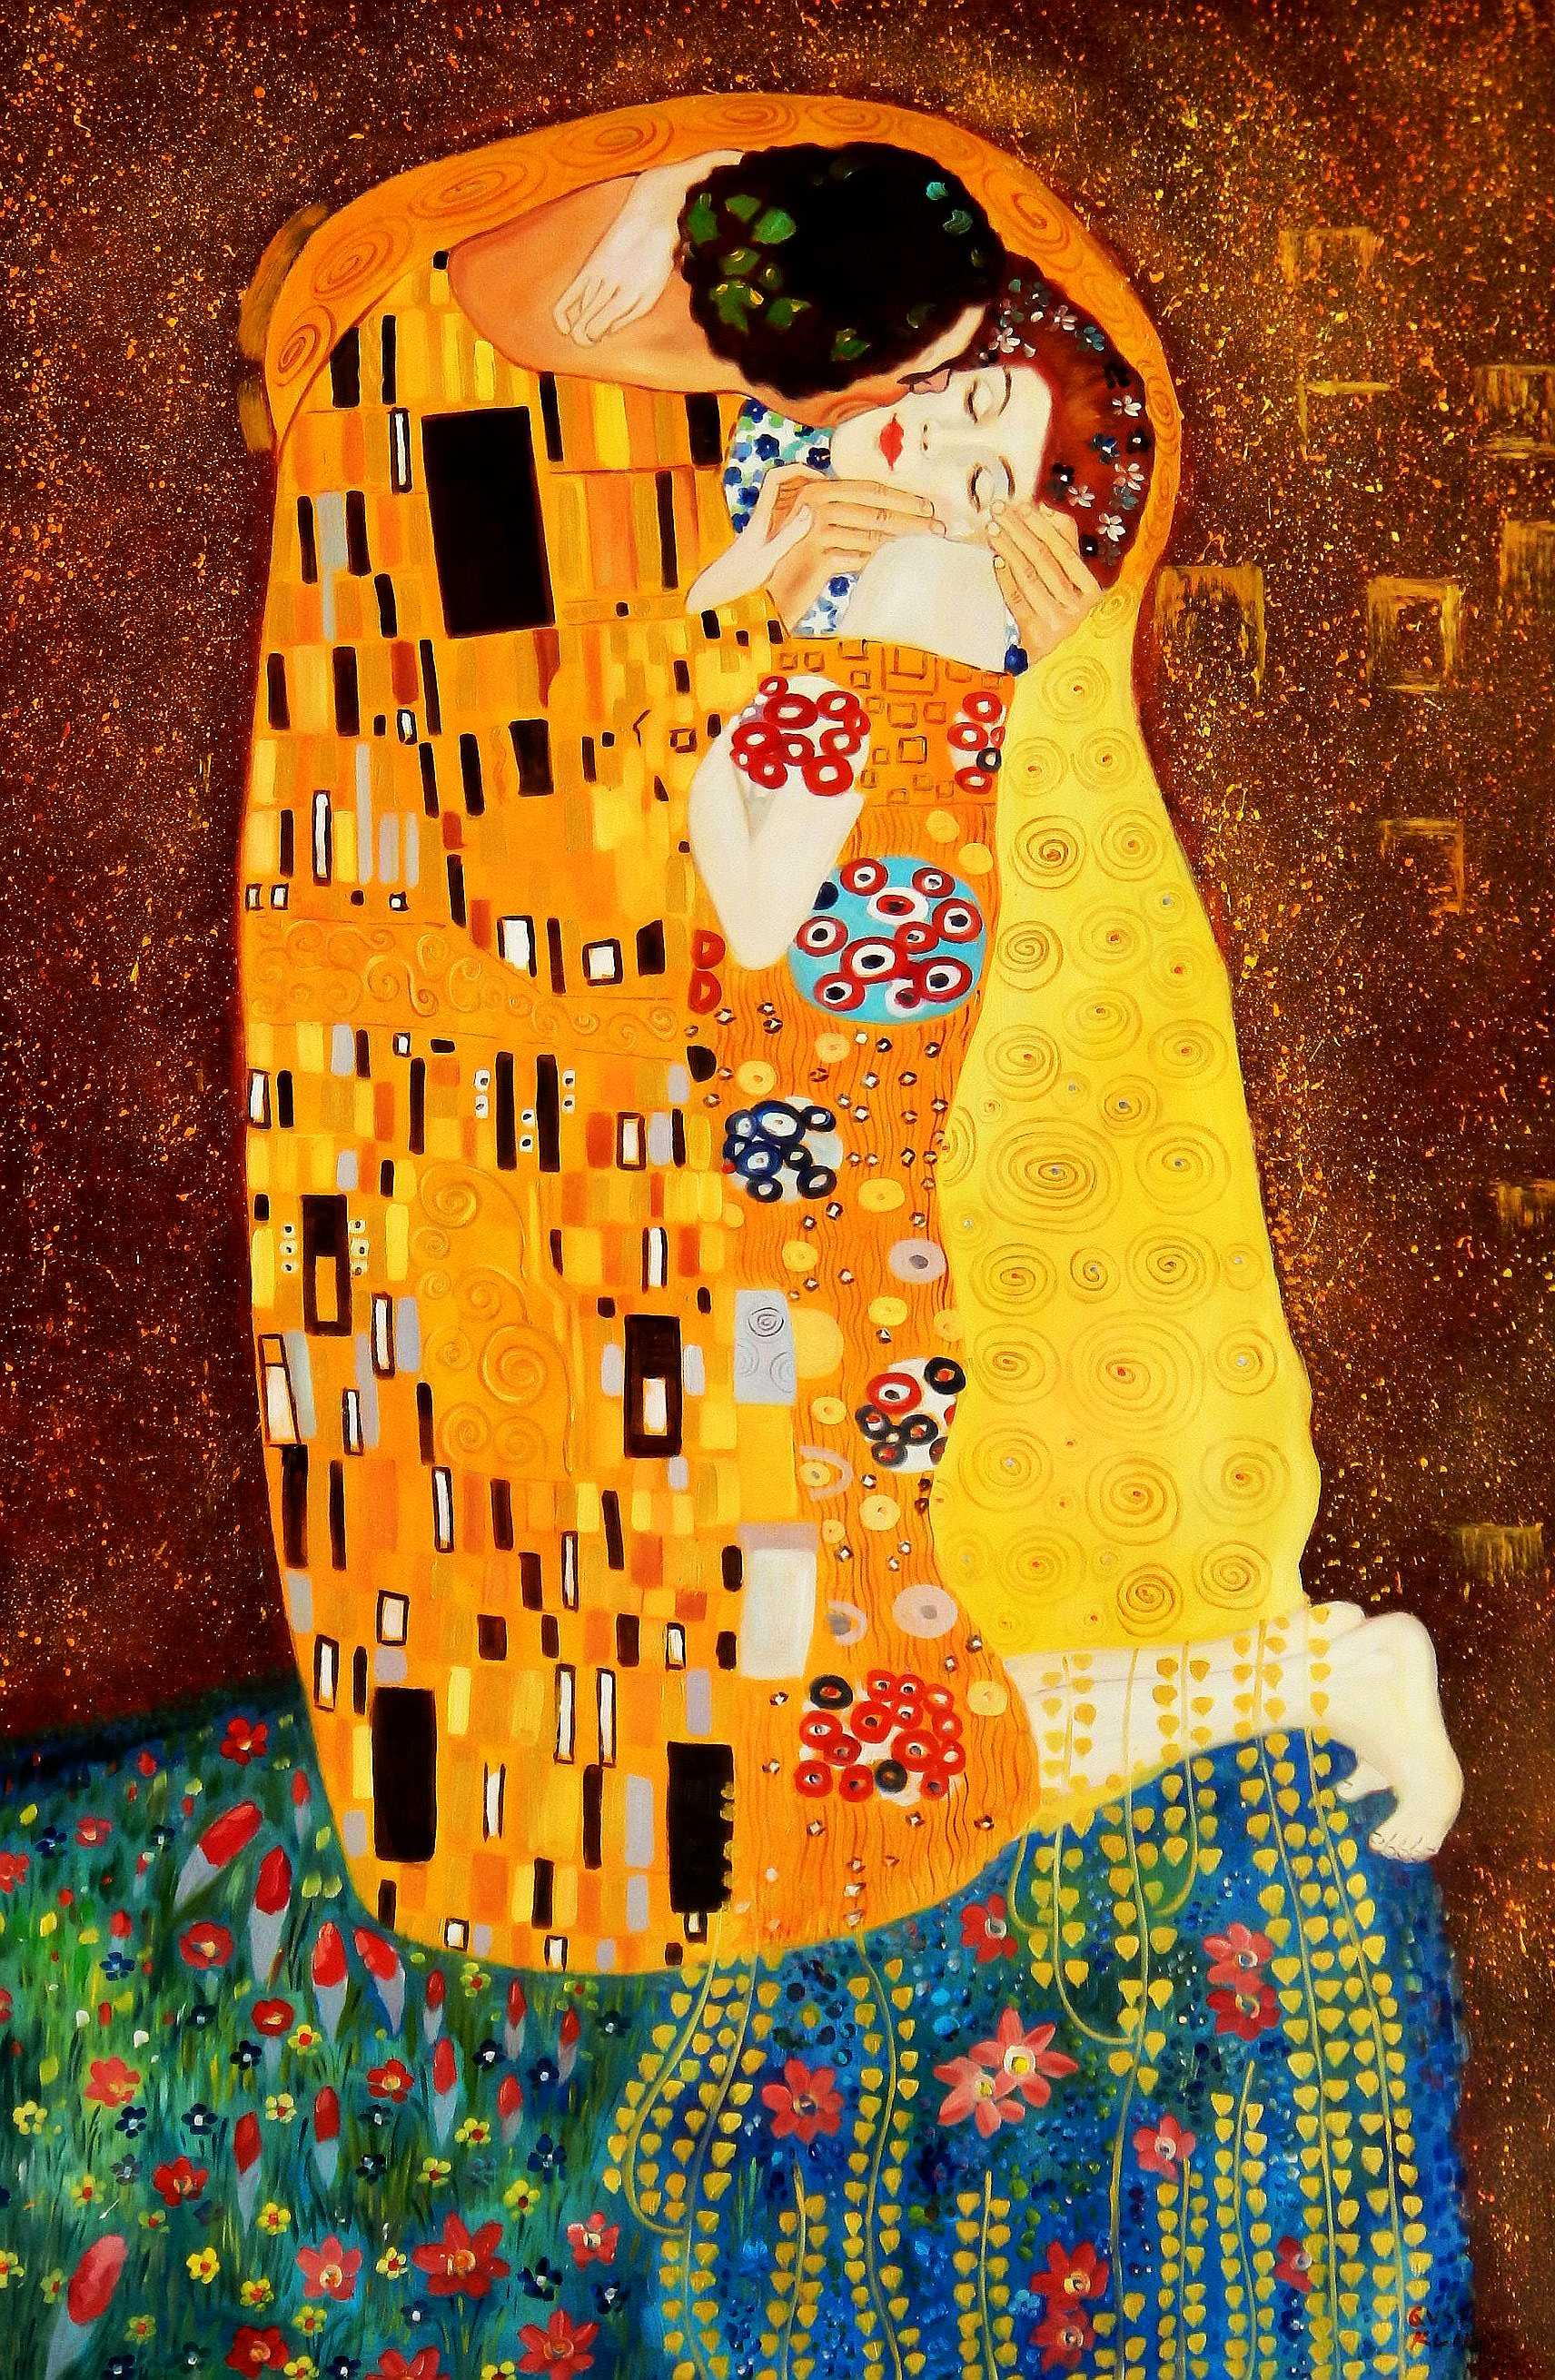 Gustav Klimt - Der Kuss p95968 120x180cm Jugendstil Ölgemälde handgemalt